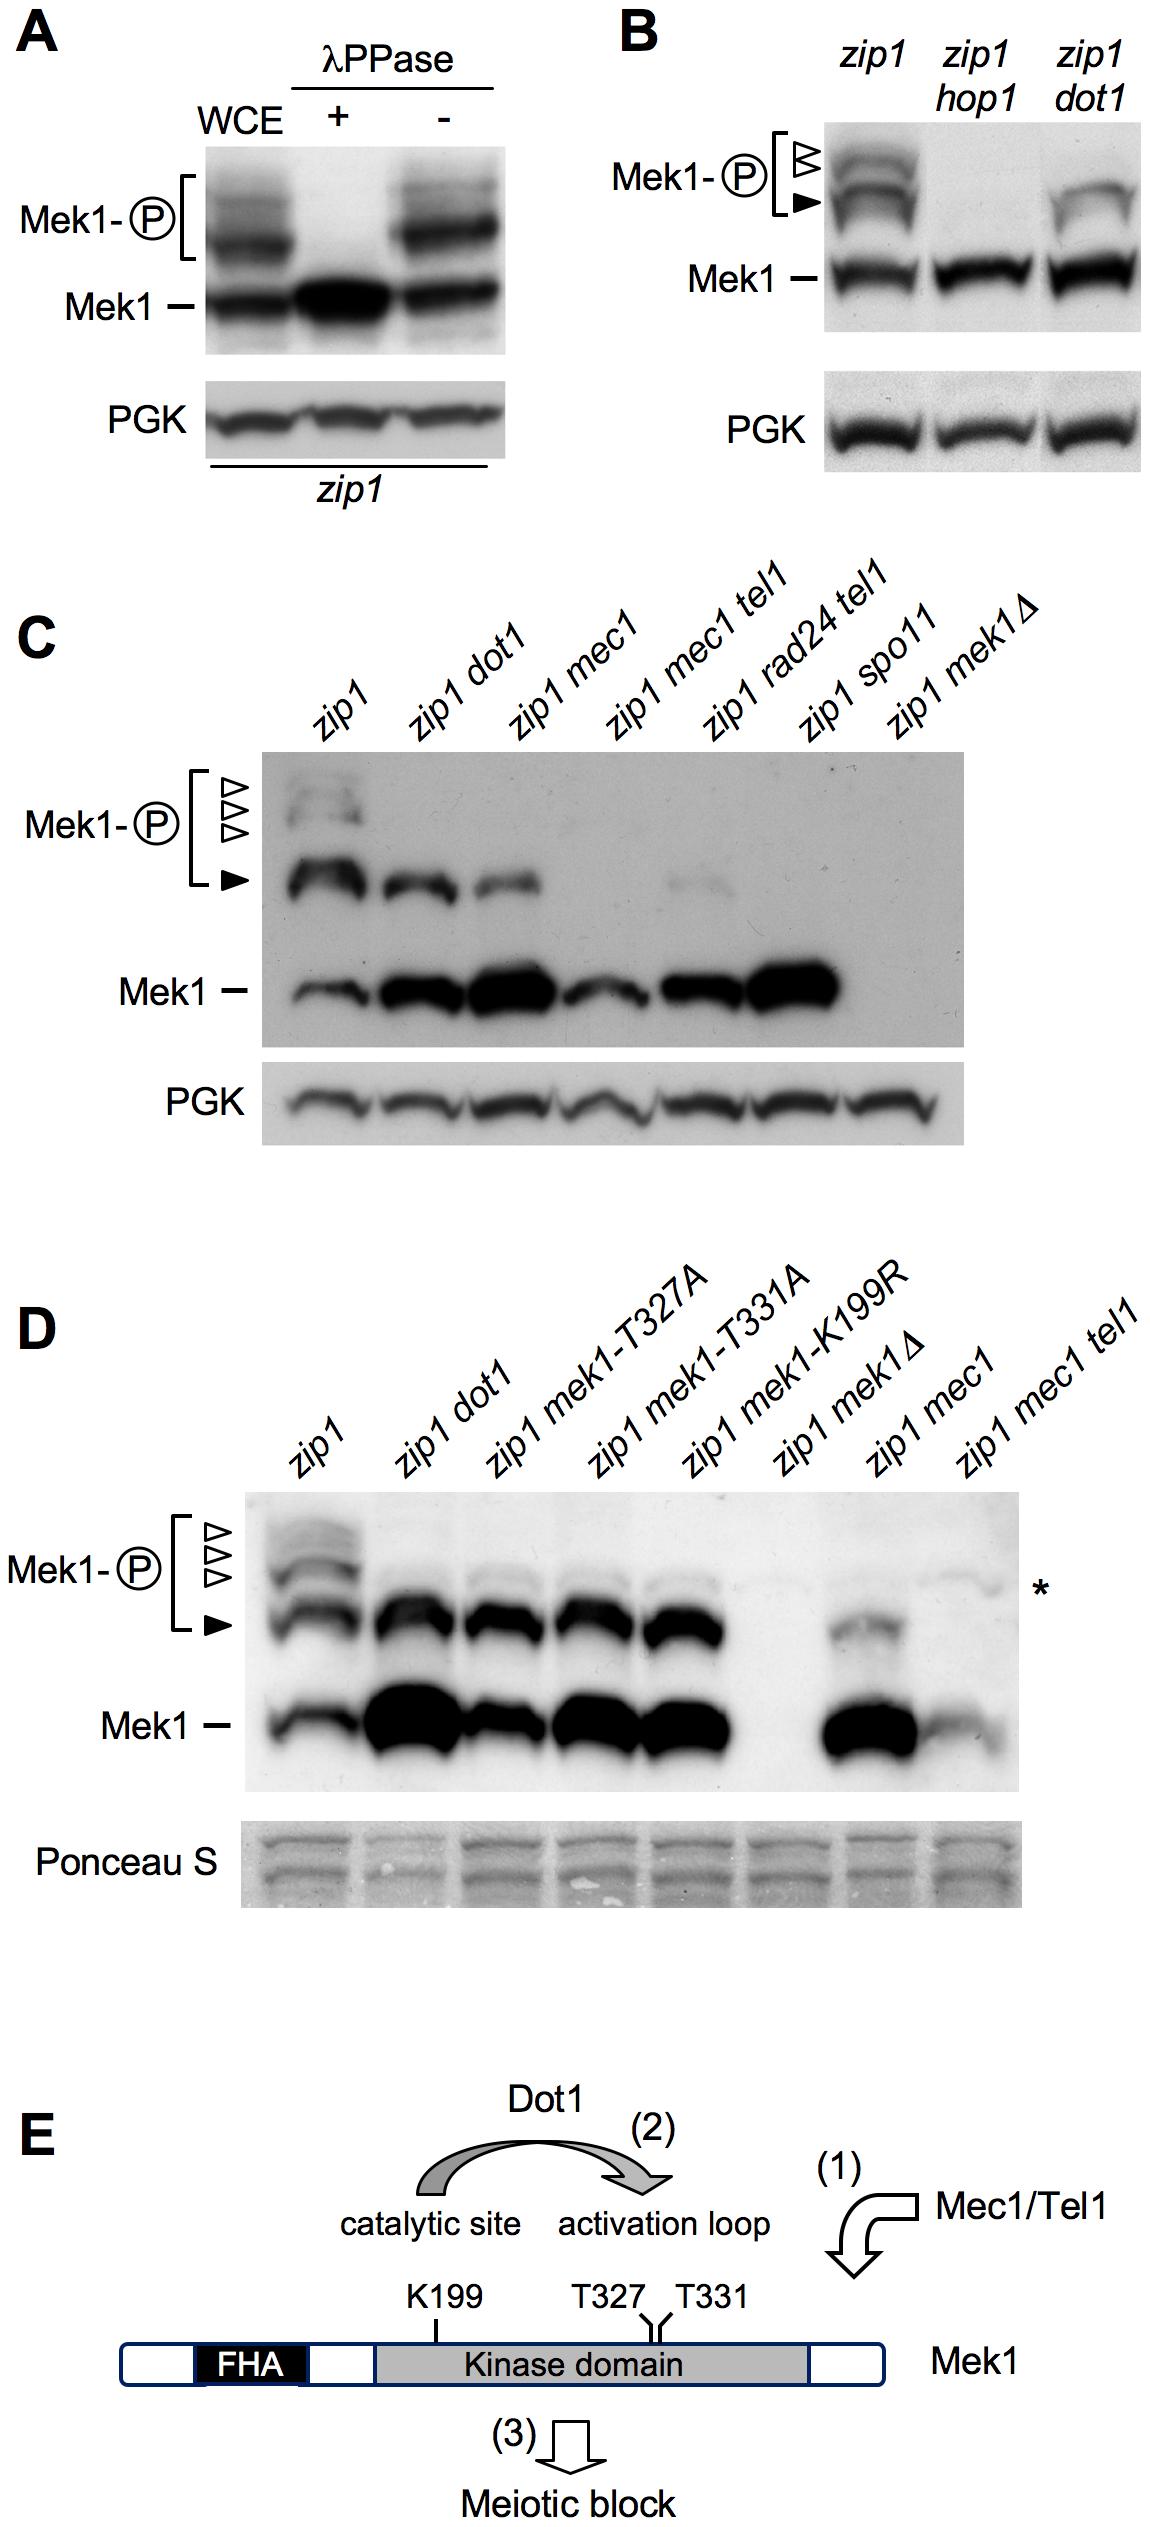 Dot1 contributes to Mek1 activation by autophosphorylation.